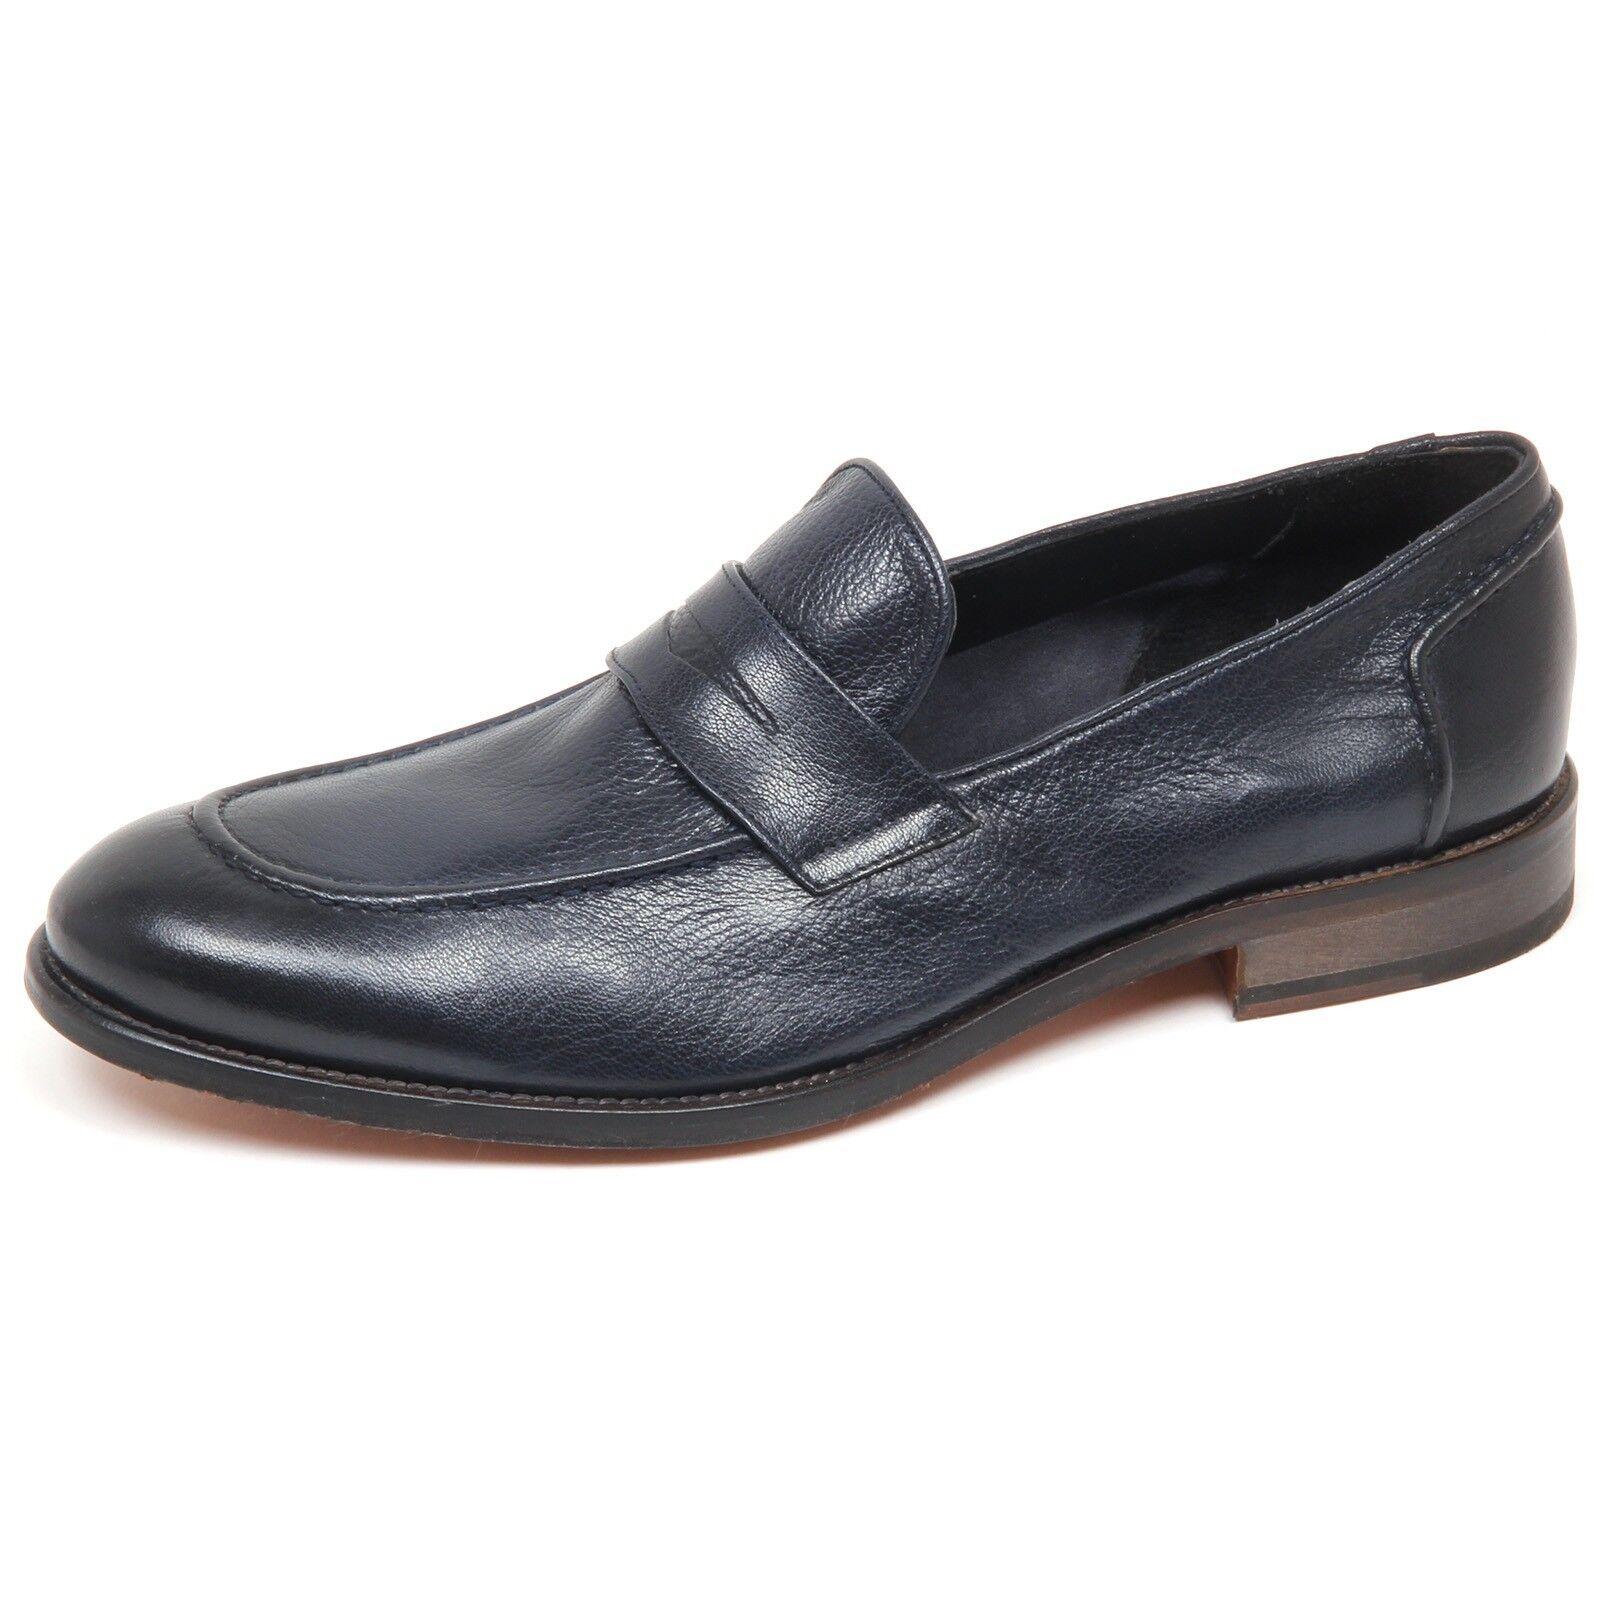 E8796 mocassino 1971 uomo blu CARACCIOLO 1971 mocassino loafer shoe man 1462c4